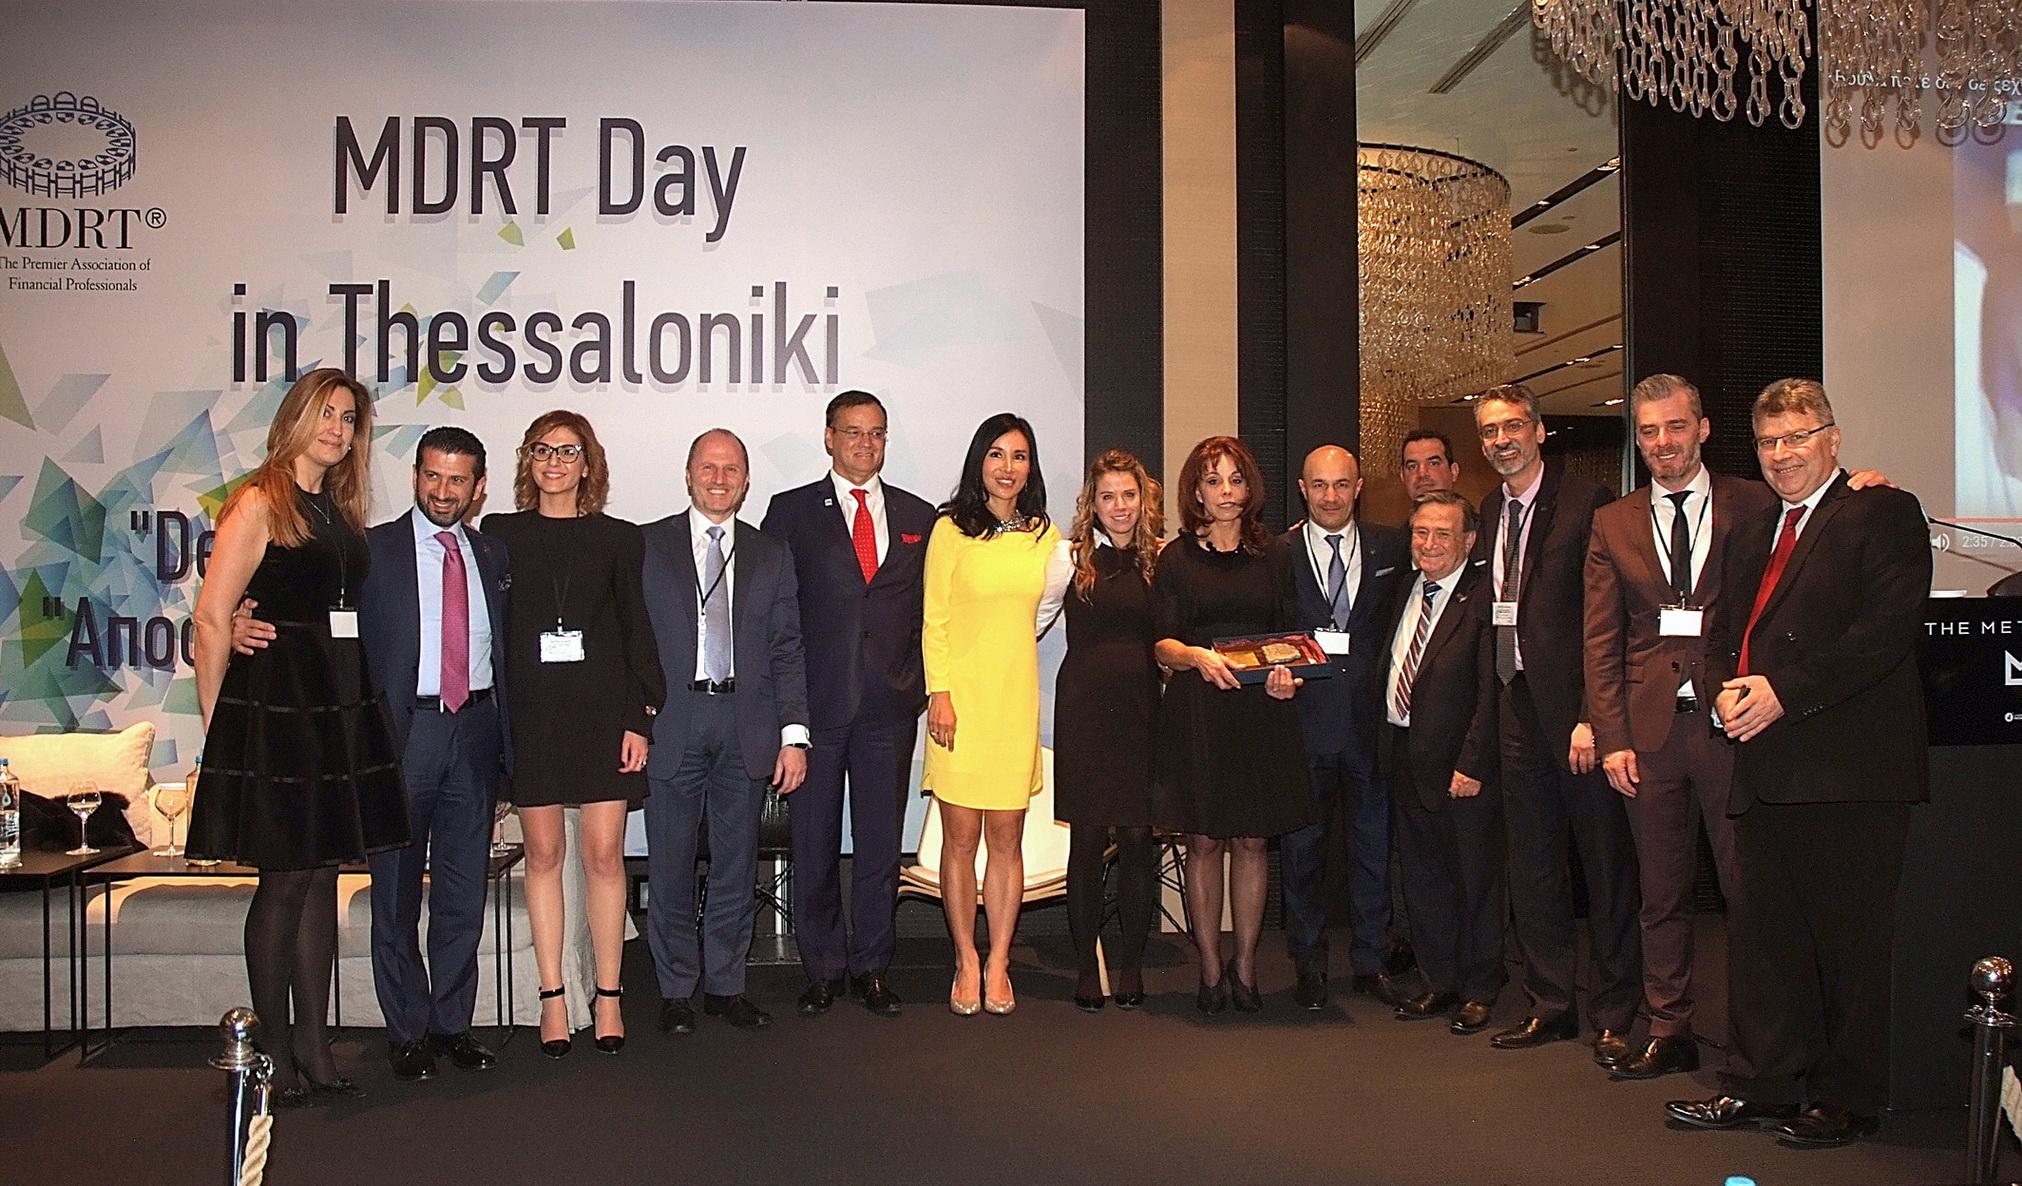 MDRT Day 2018 Thessaloniki, Greece